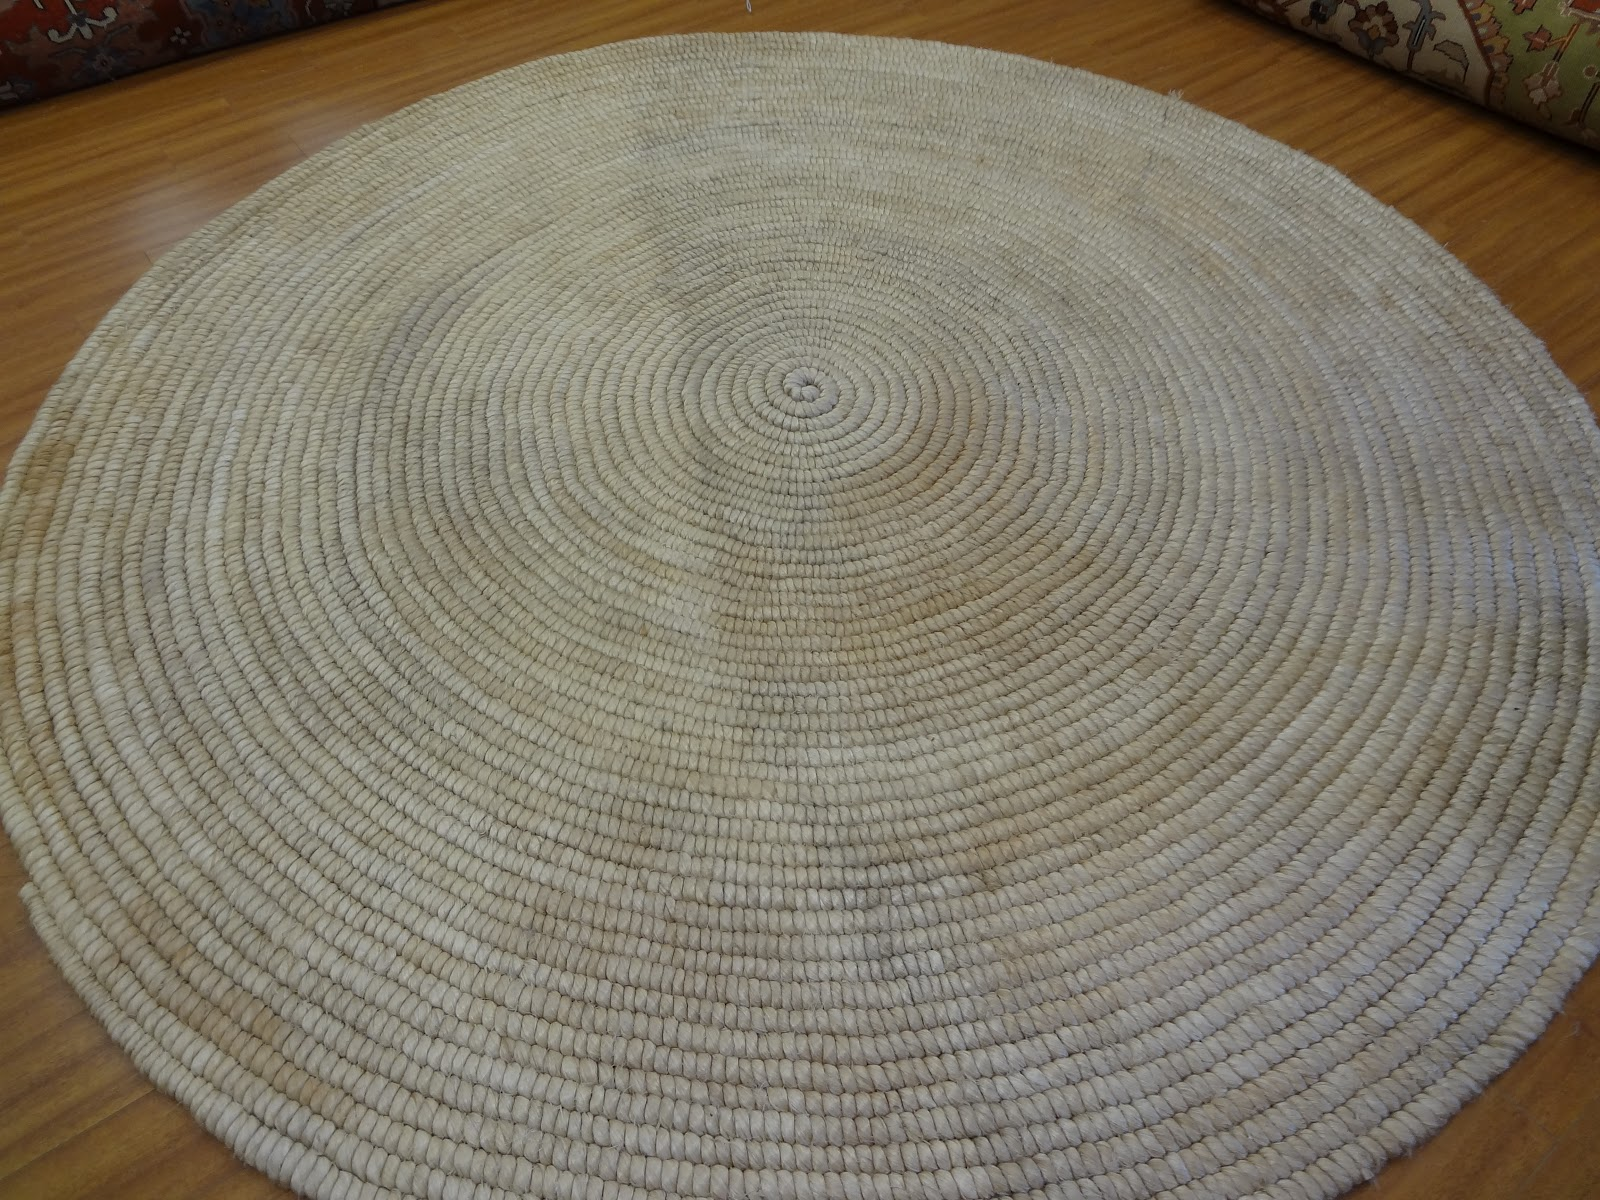 Rug Master Sisal Seagrass Hemp And Jute Rug Carpet